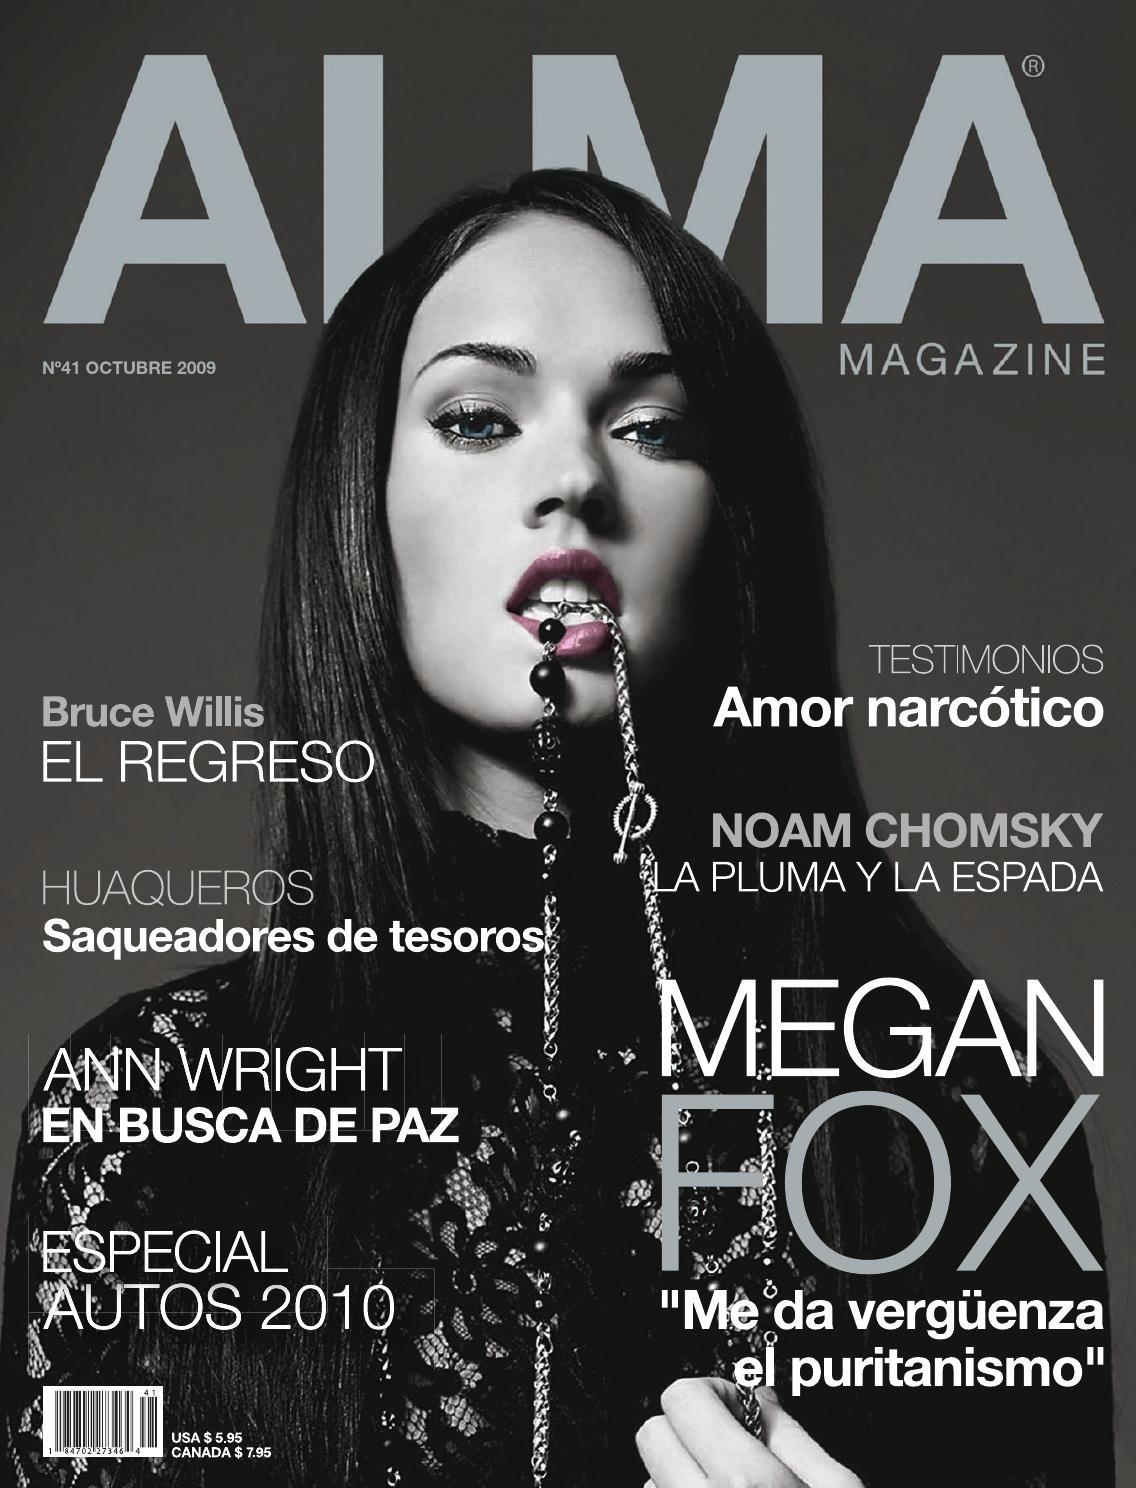 ALMA MAGAZINE 41 - OCTUBRE 2009 by ALMA MAGAZINE - issuu